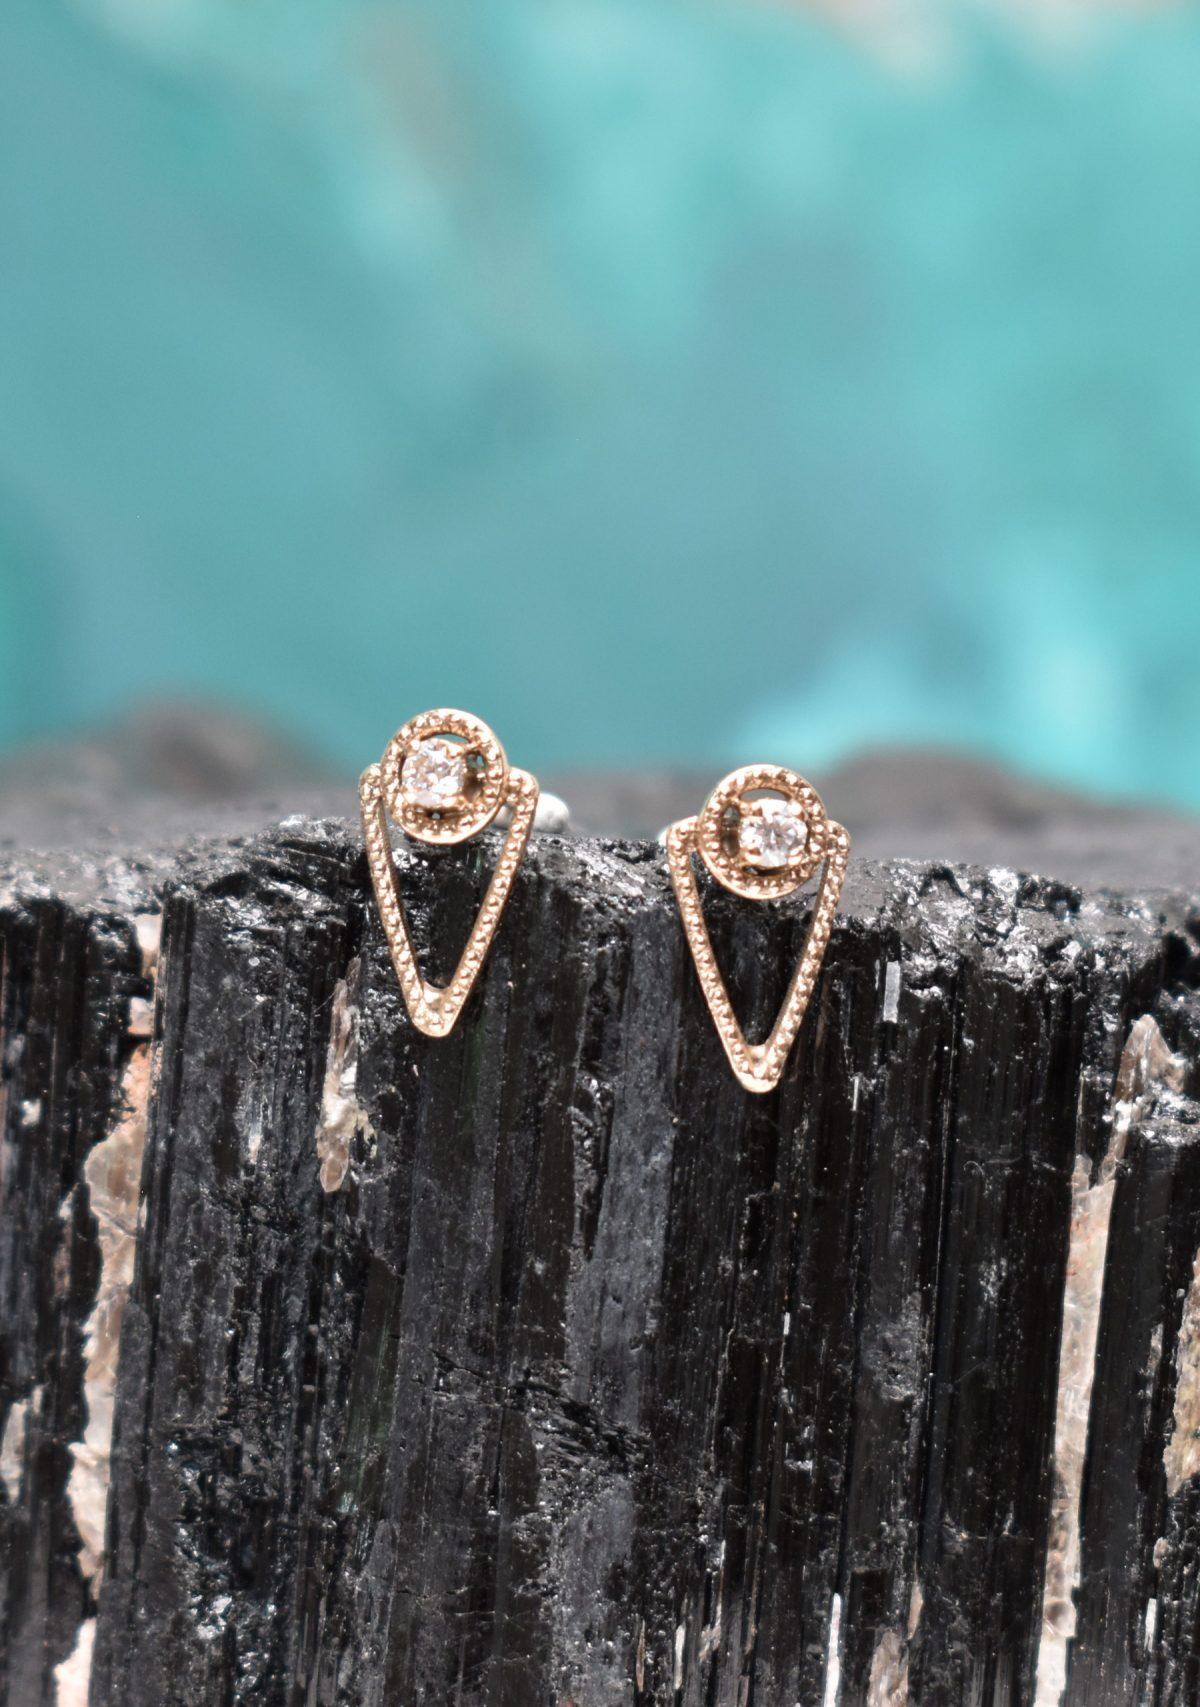 Mini Drop Earrings in 10k Gold and Moissanite